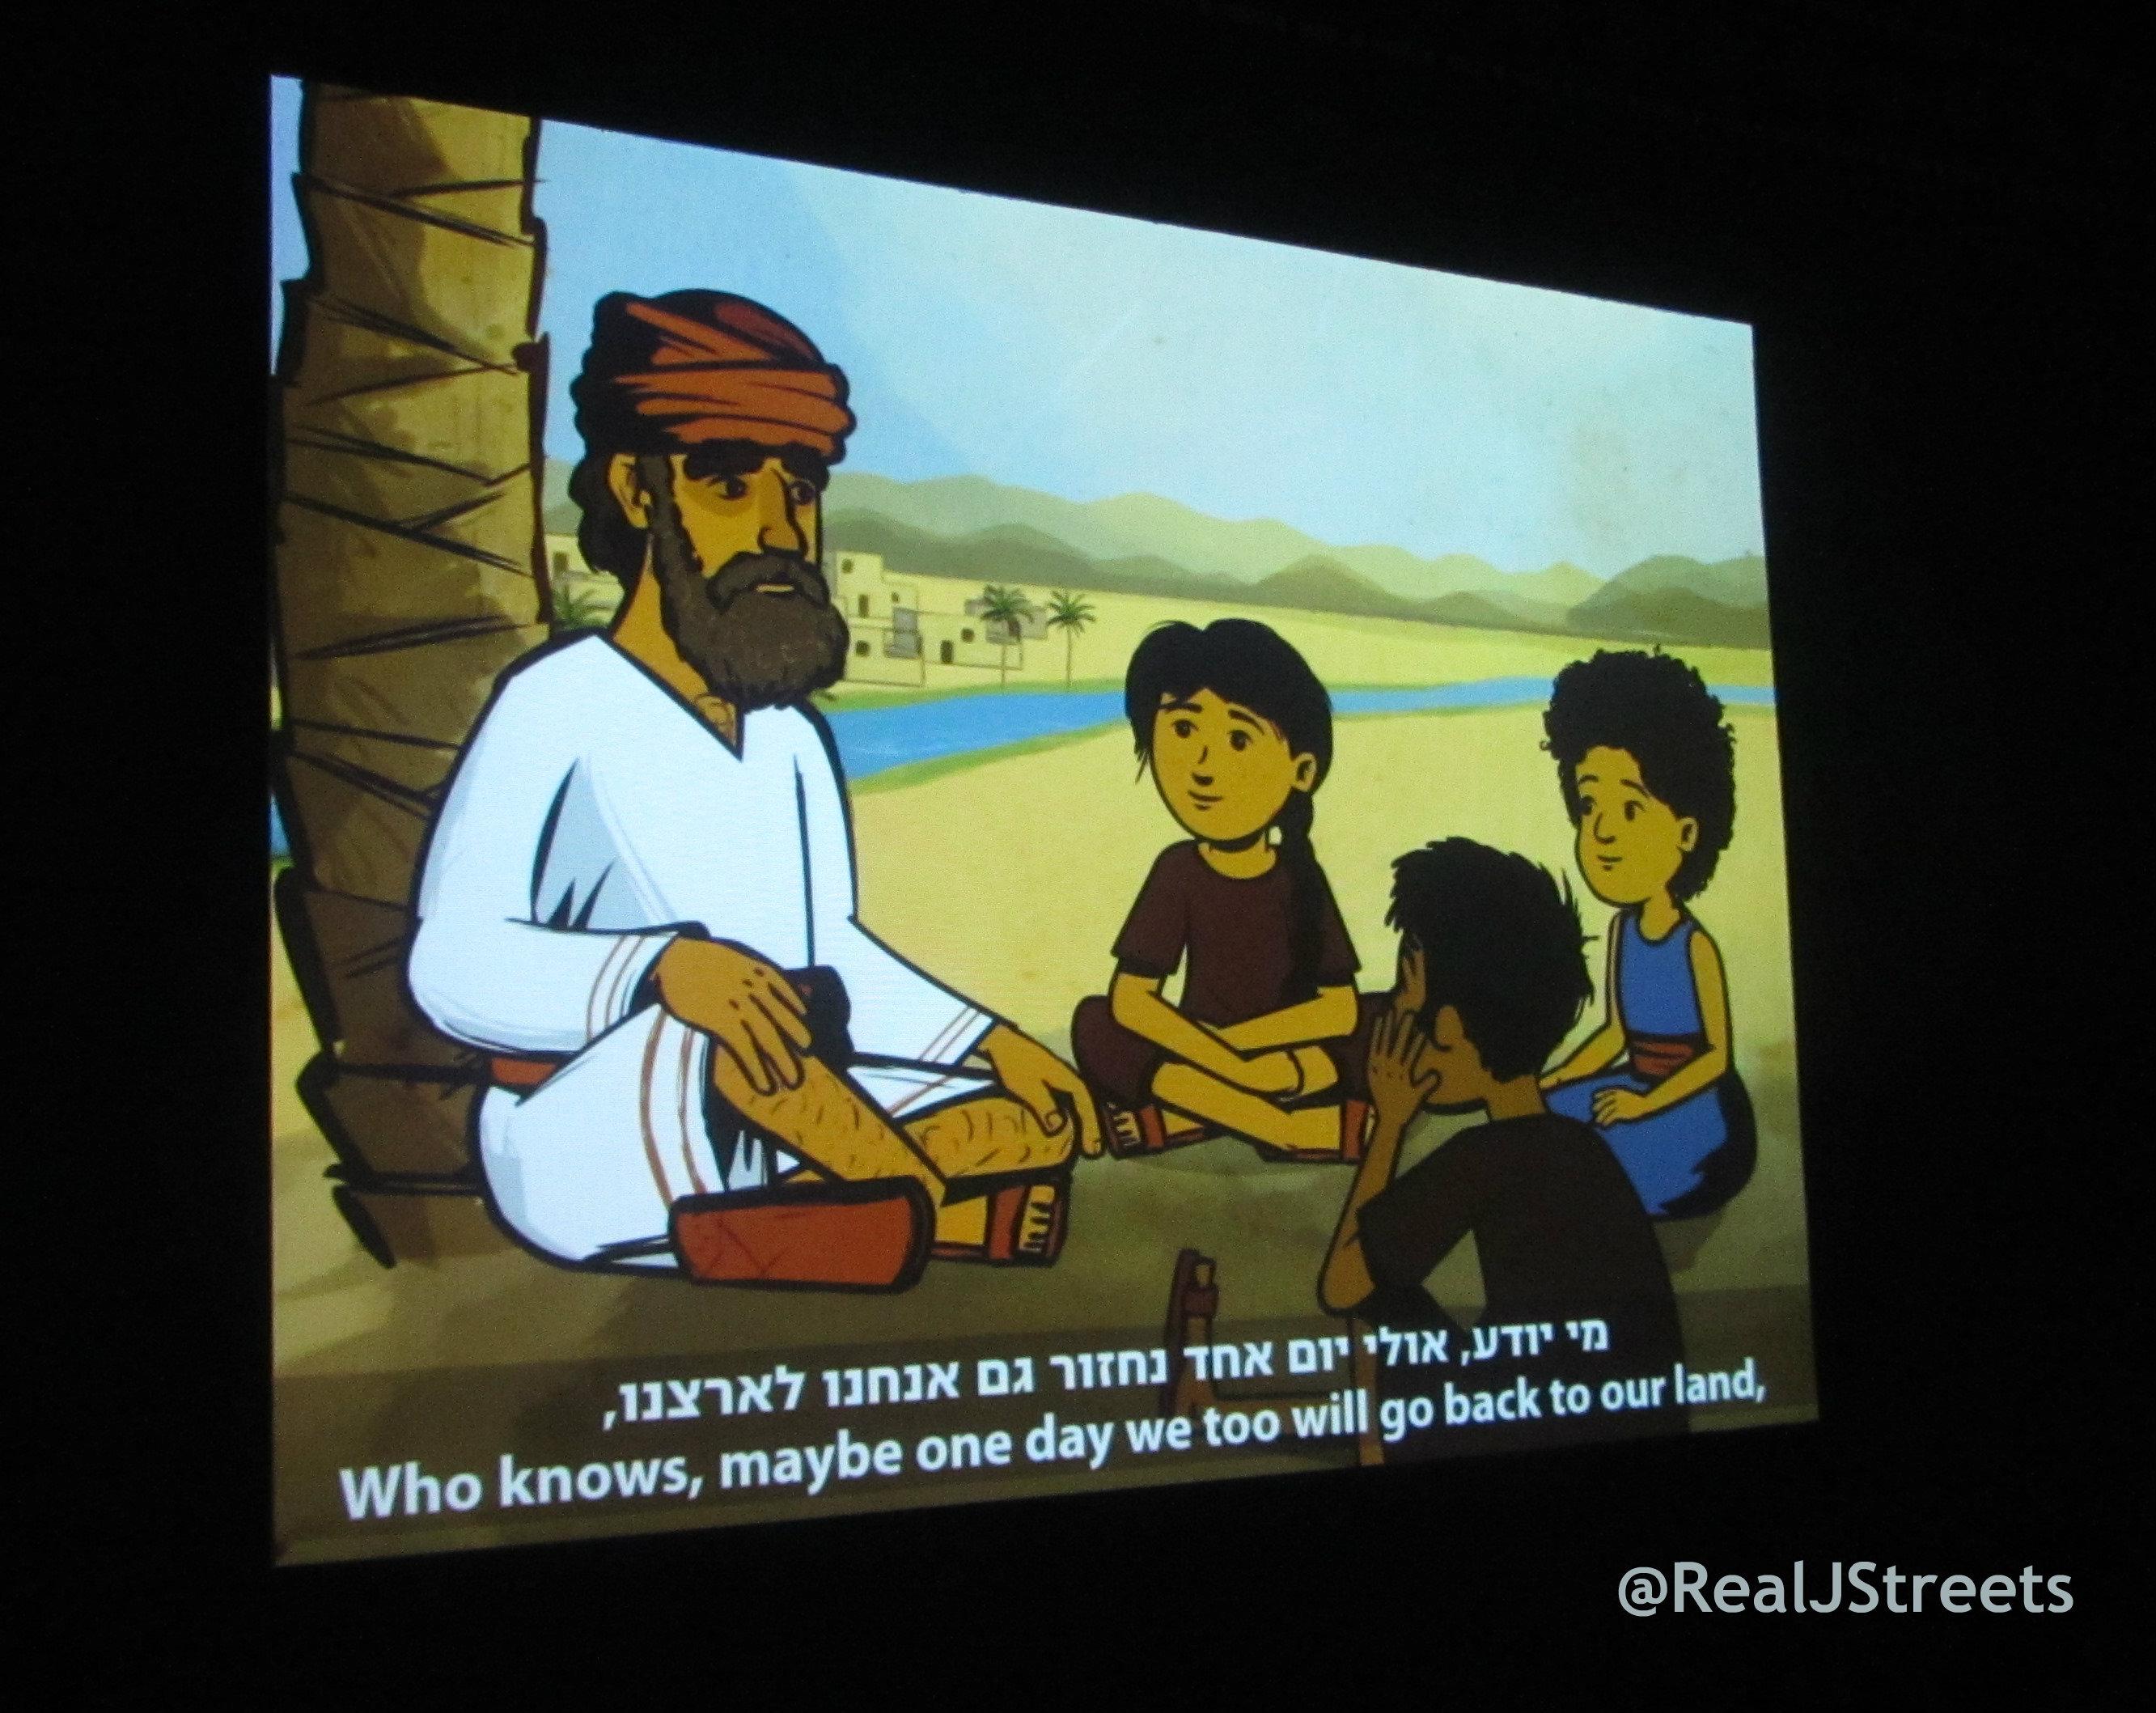 image return to Zion